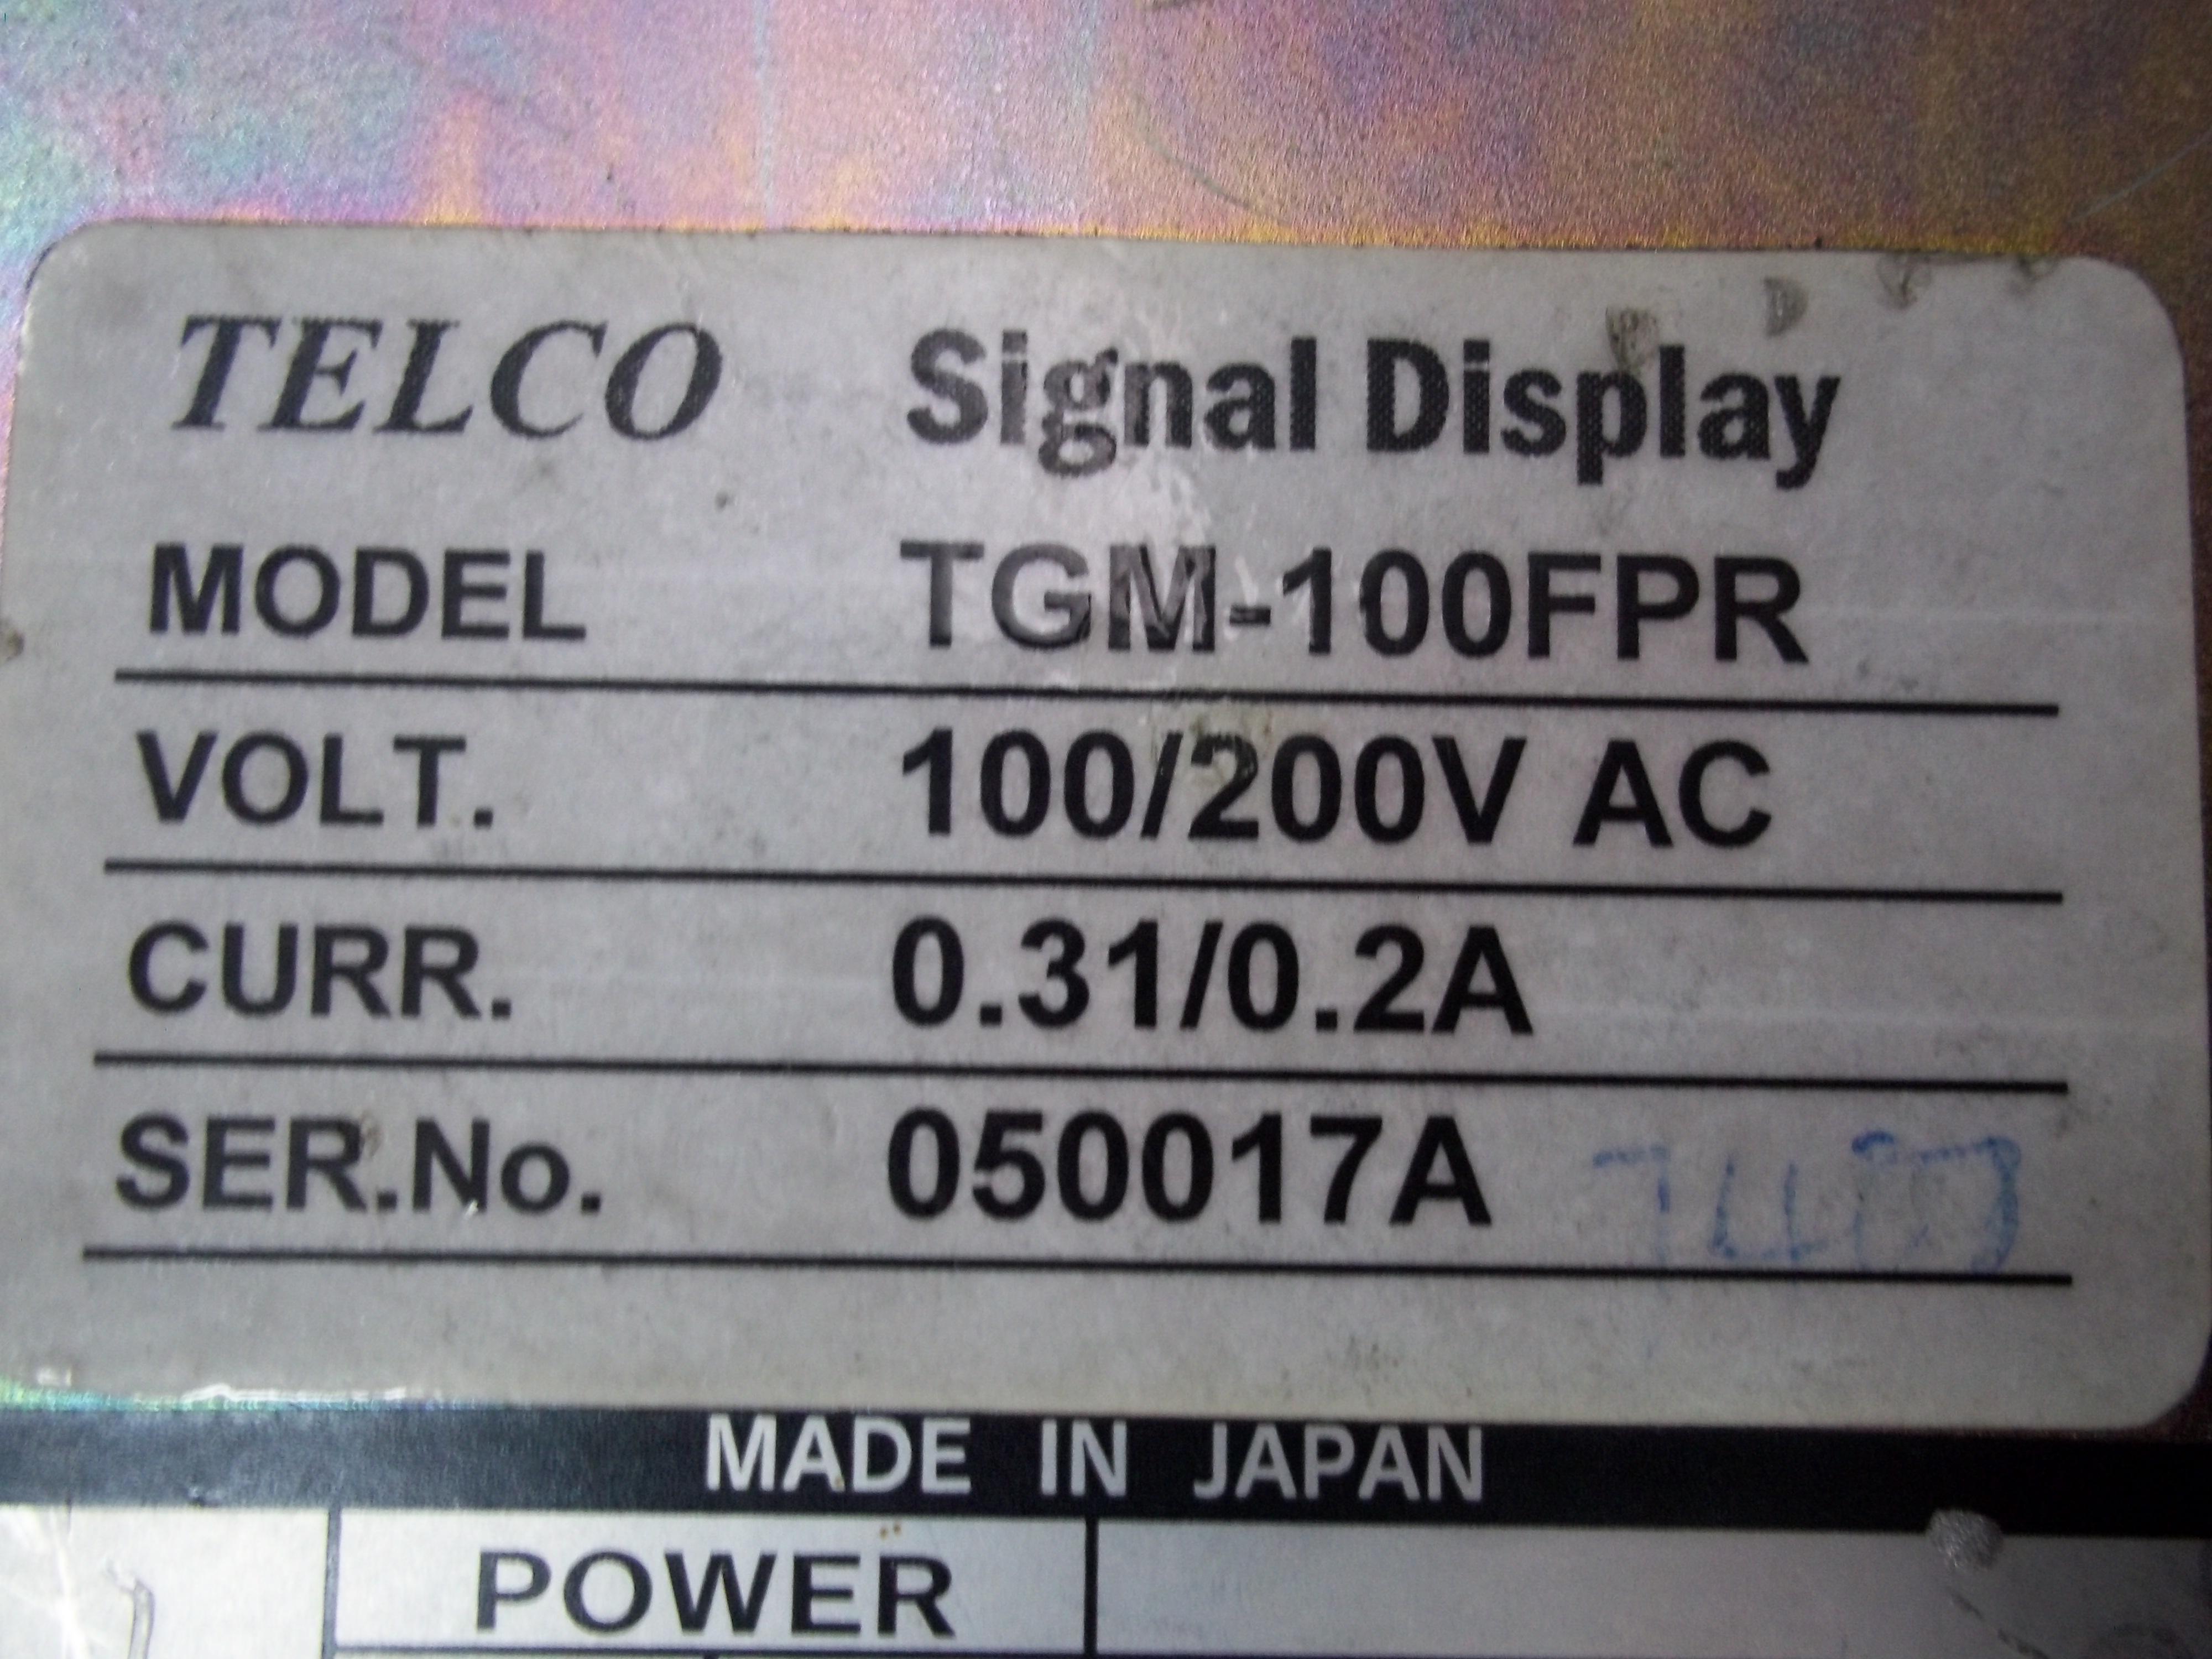 Repair TGM-100FPR TELCO  TELCO SIGNAL DISPLAY in Malaysia, Singapore, Thailand, Indonesia